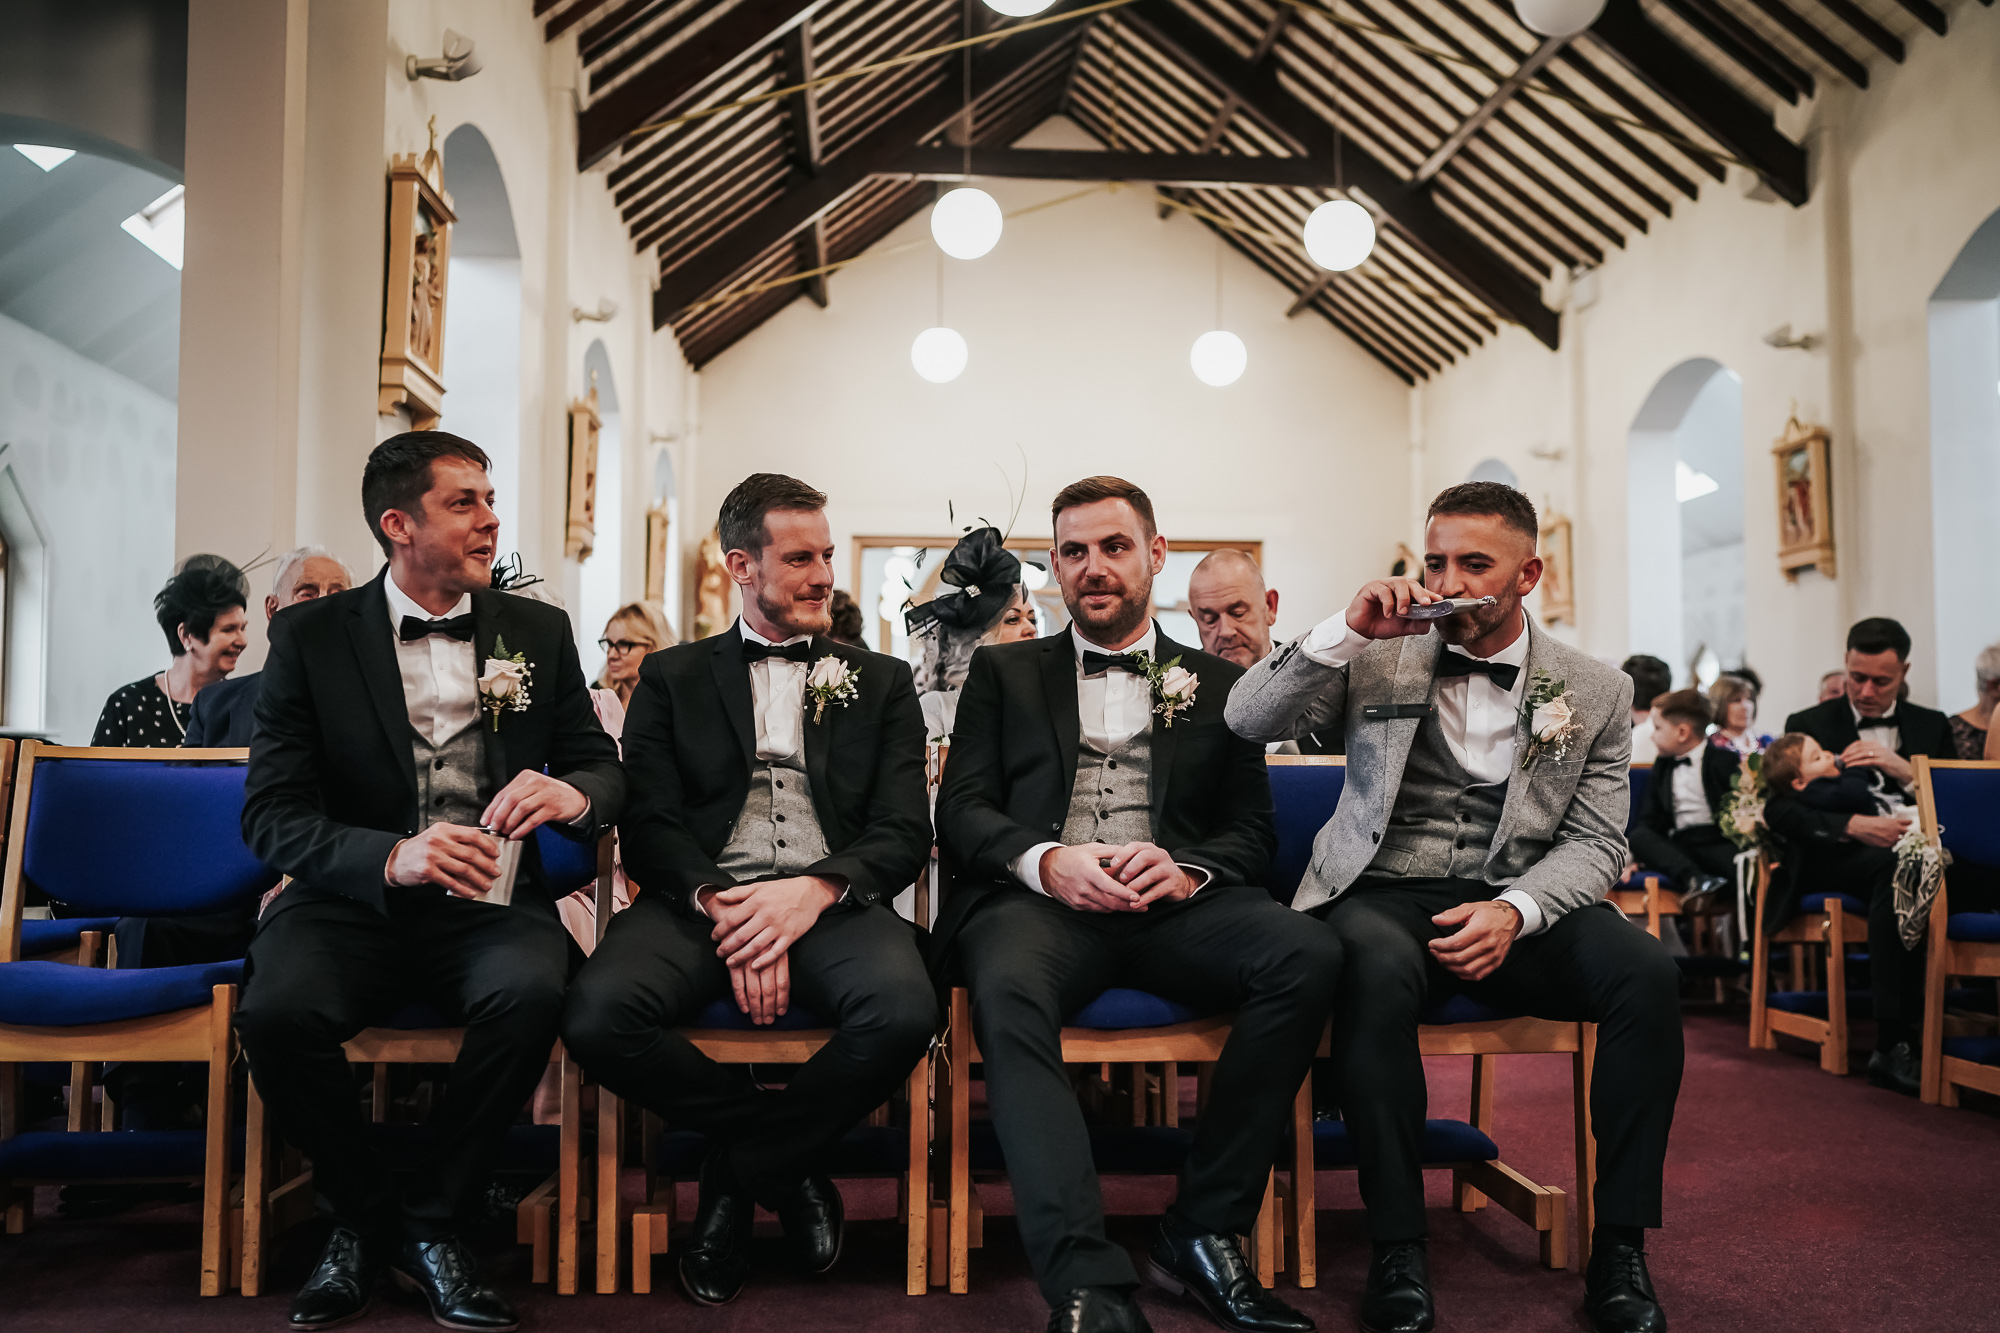 The Hayloft Wedding Photography Cheshire wedding photographer (18 of 52).jpg